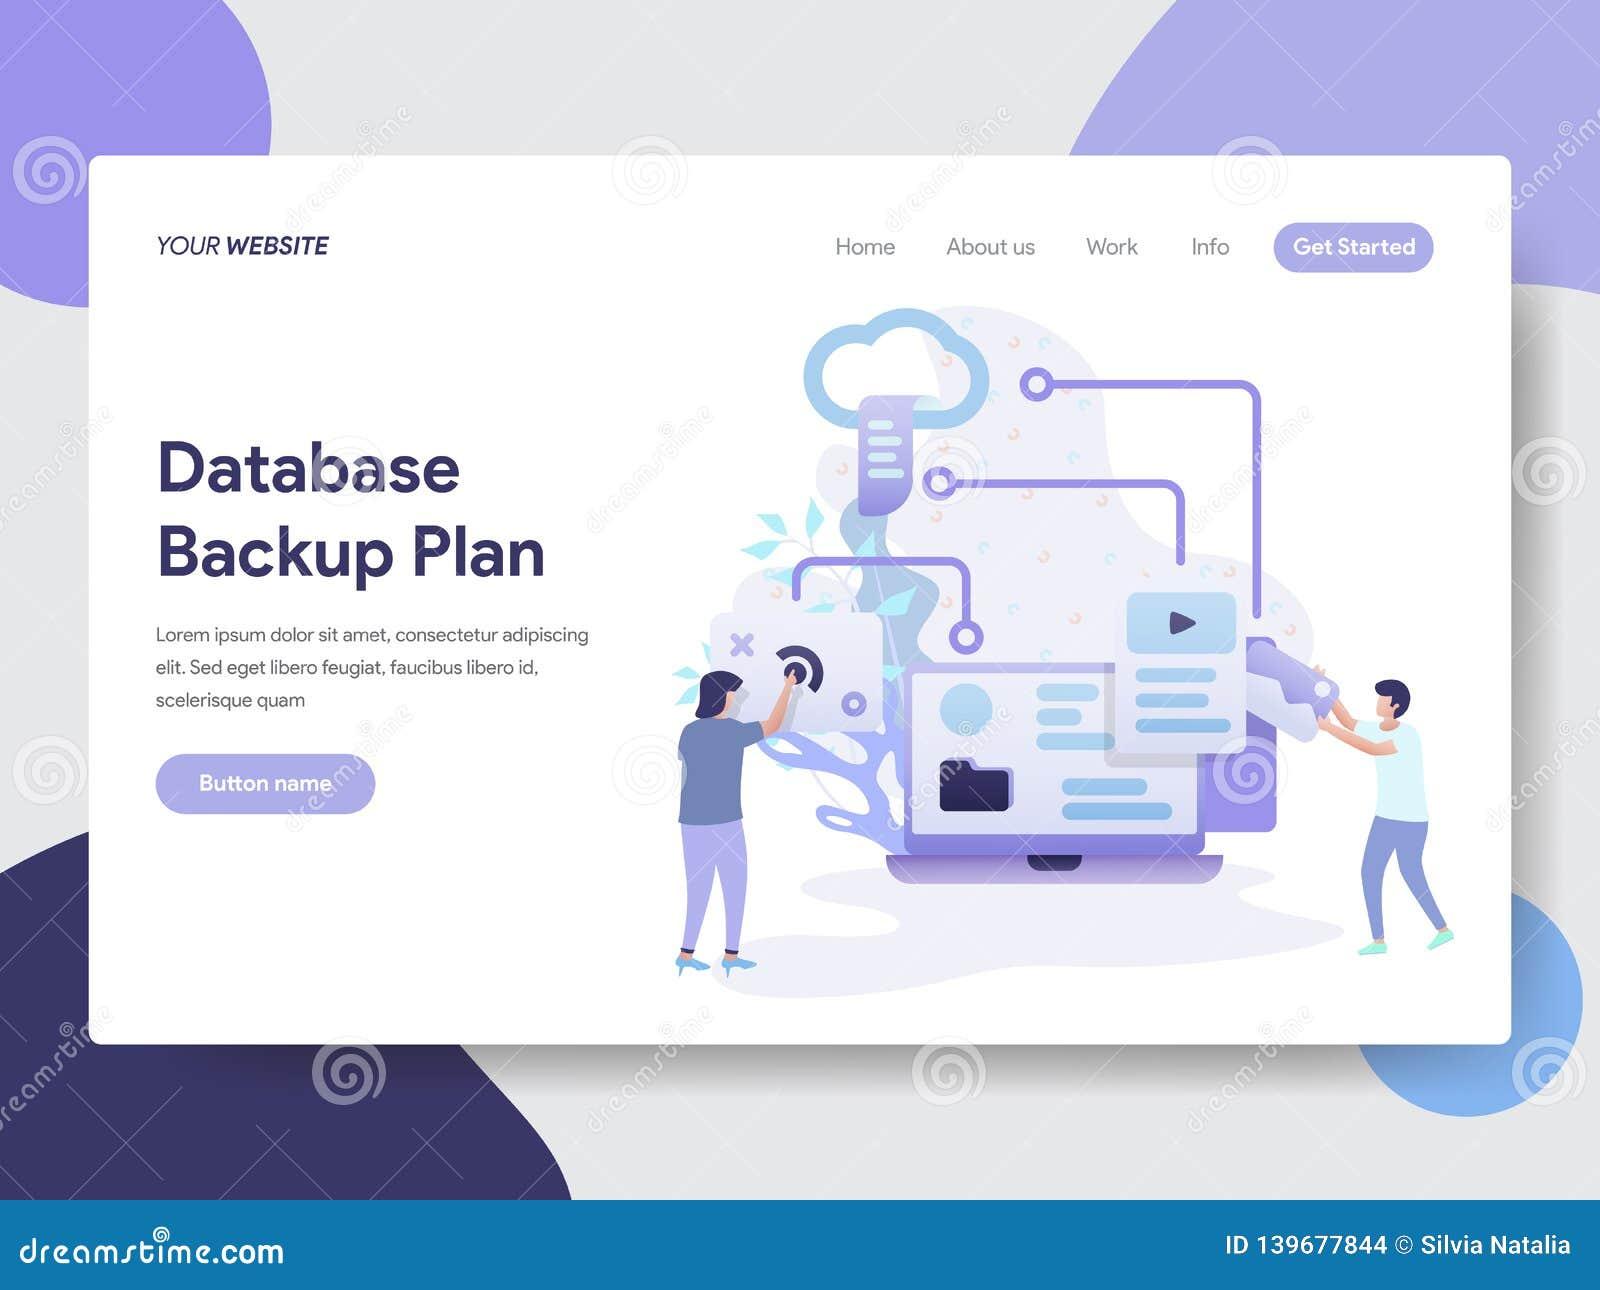 Landing page template of Database Backup Plan Illustration Concept. Modern flat design concept of web page design for website and